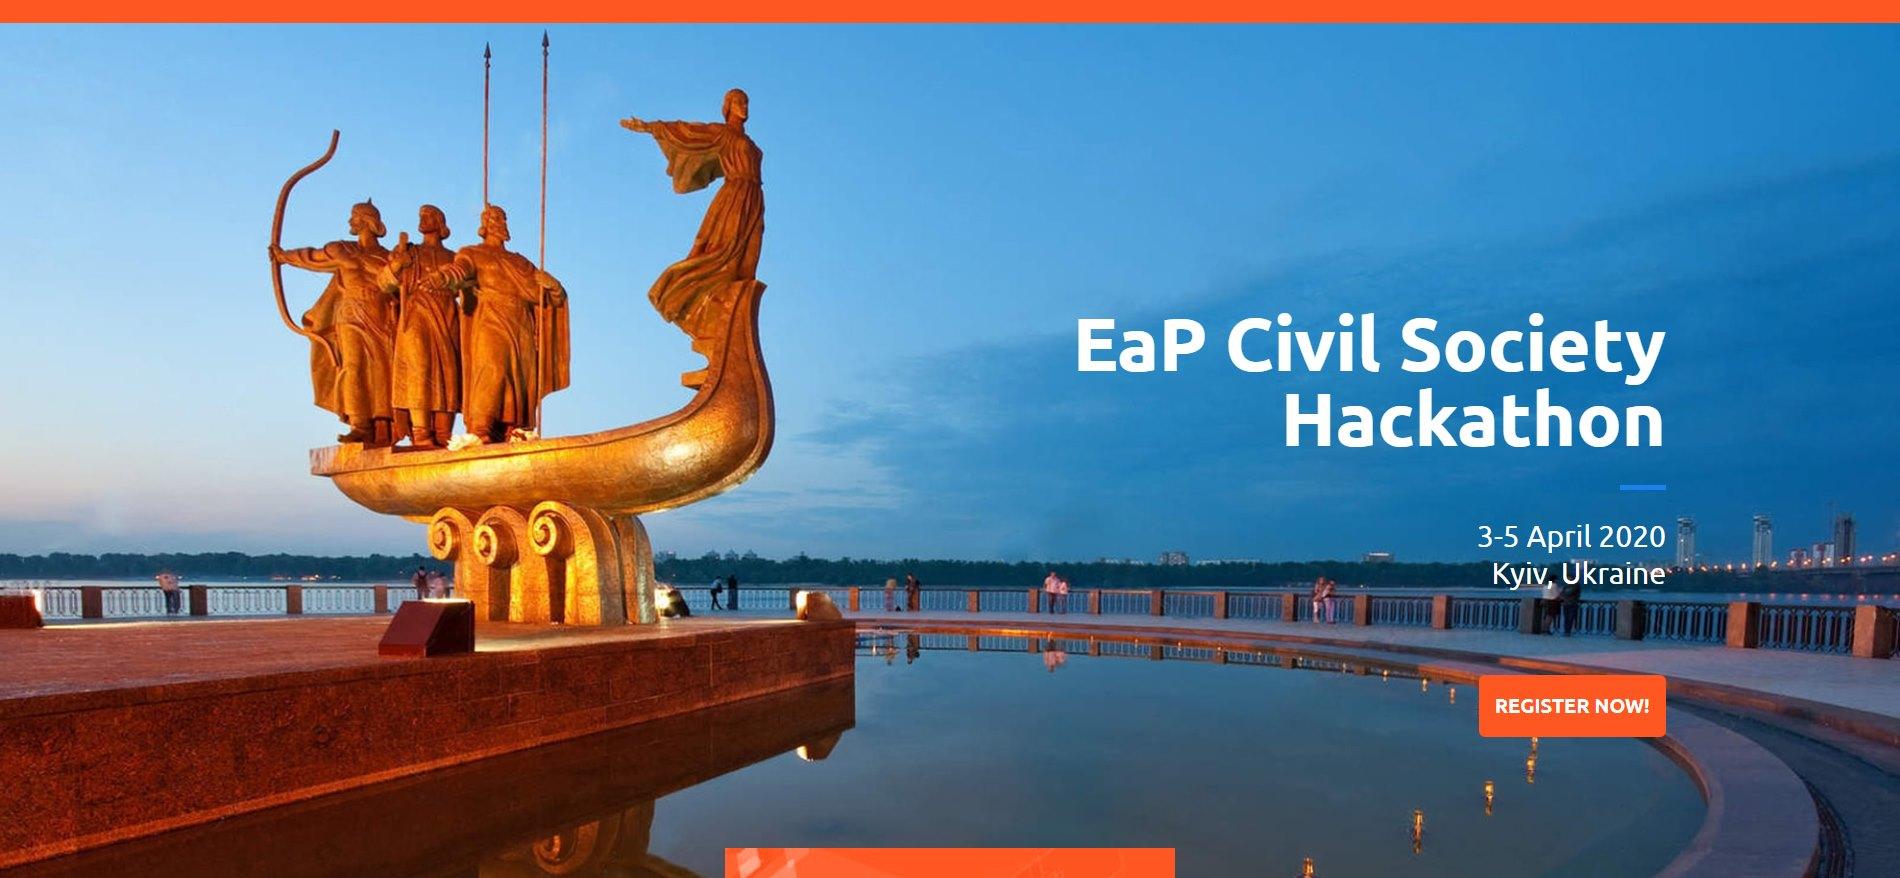 2020 EaP Civil Society Hackathon